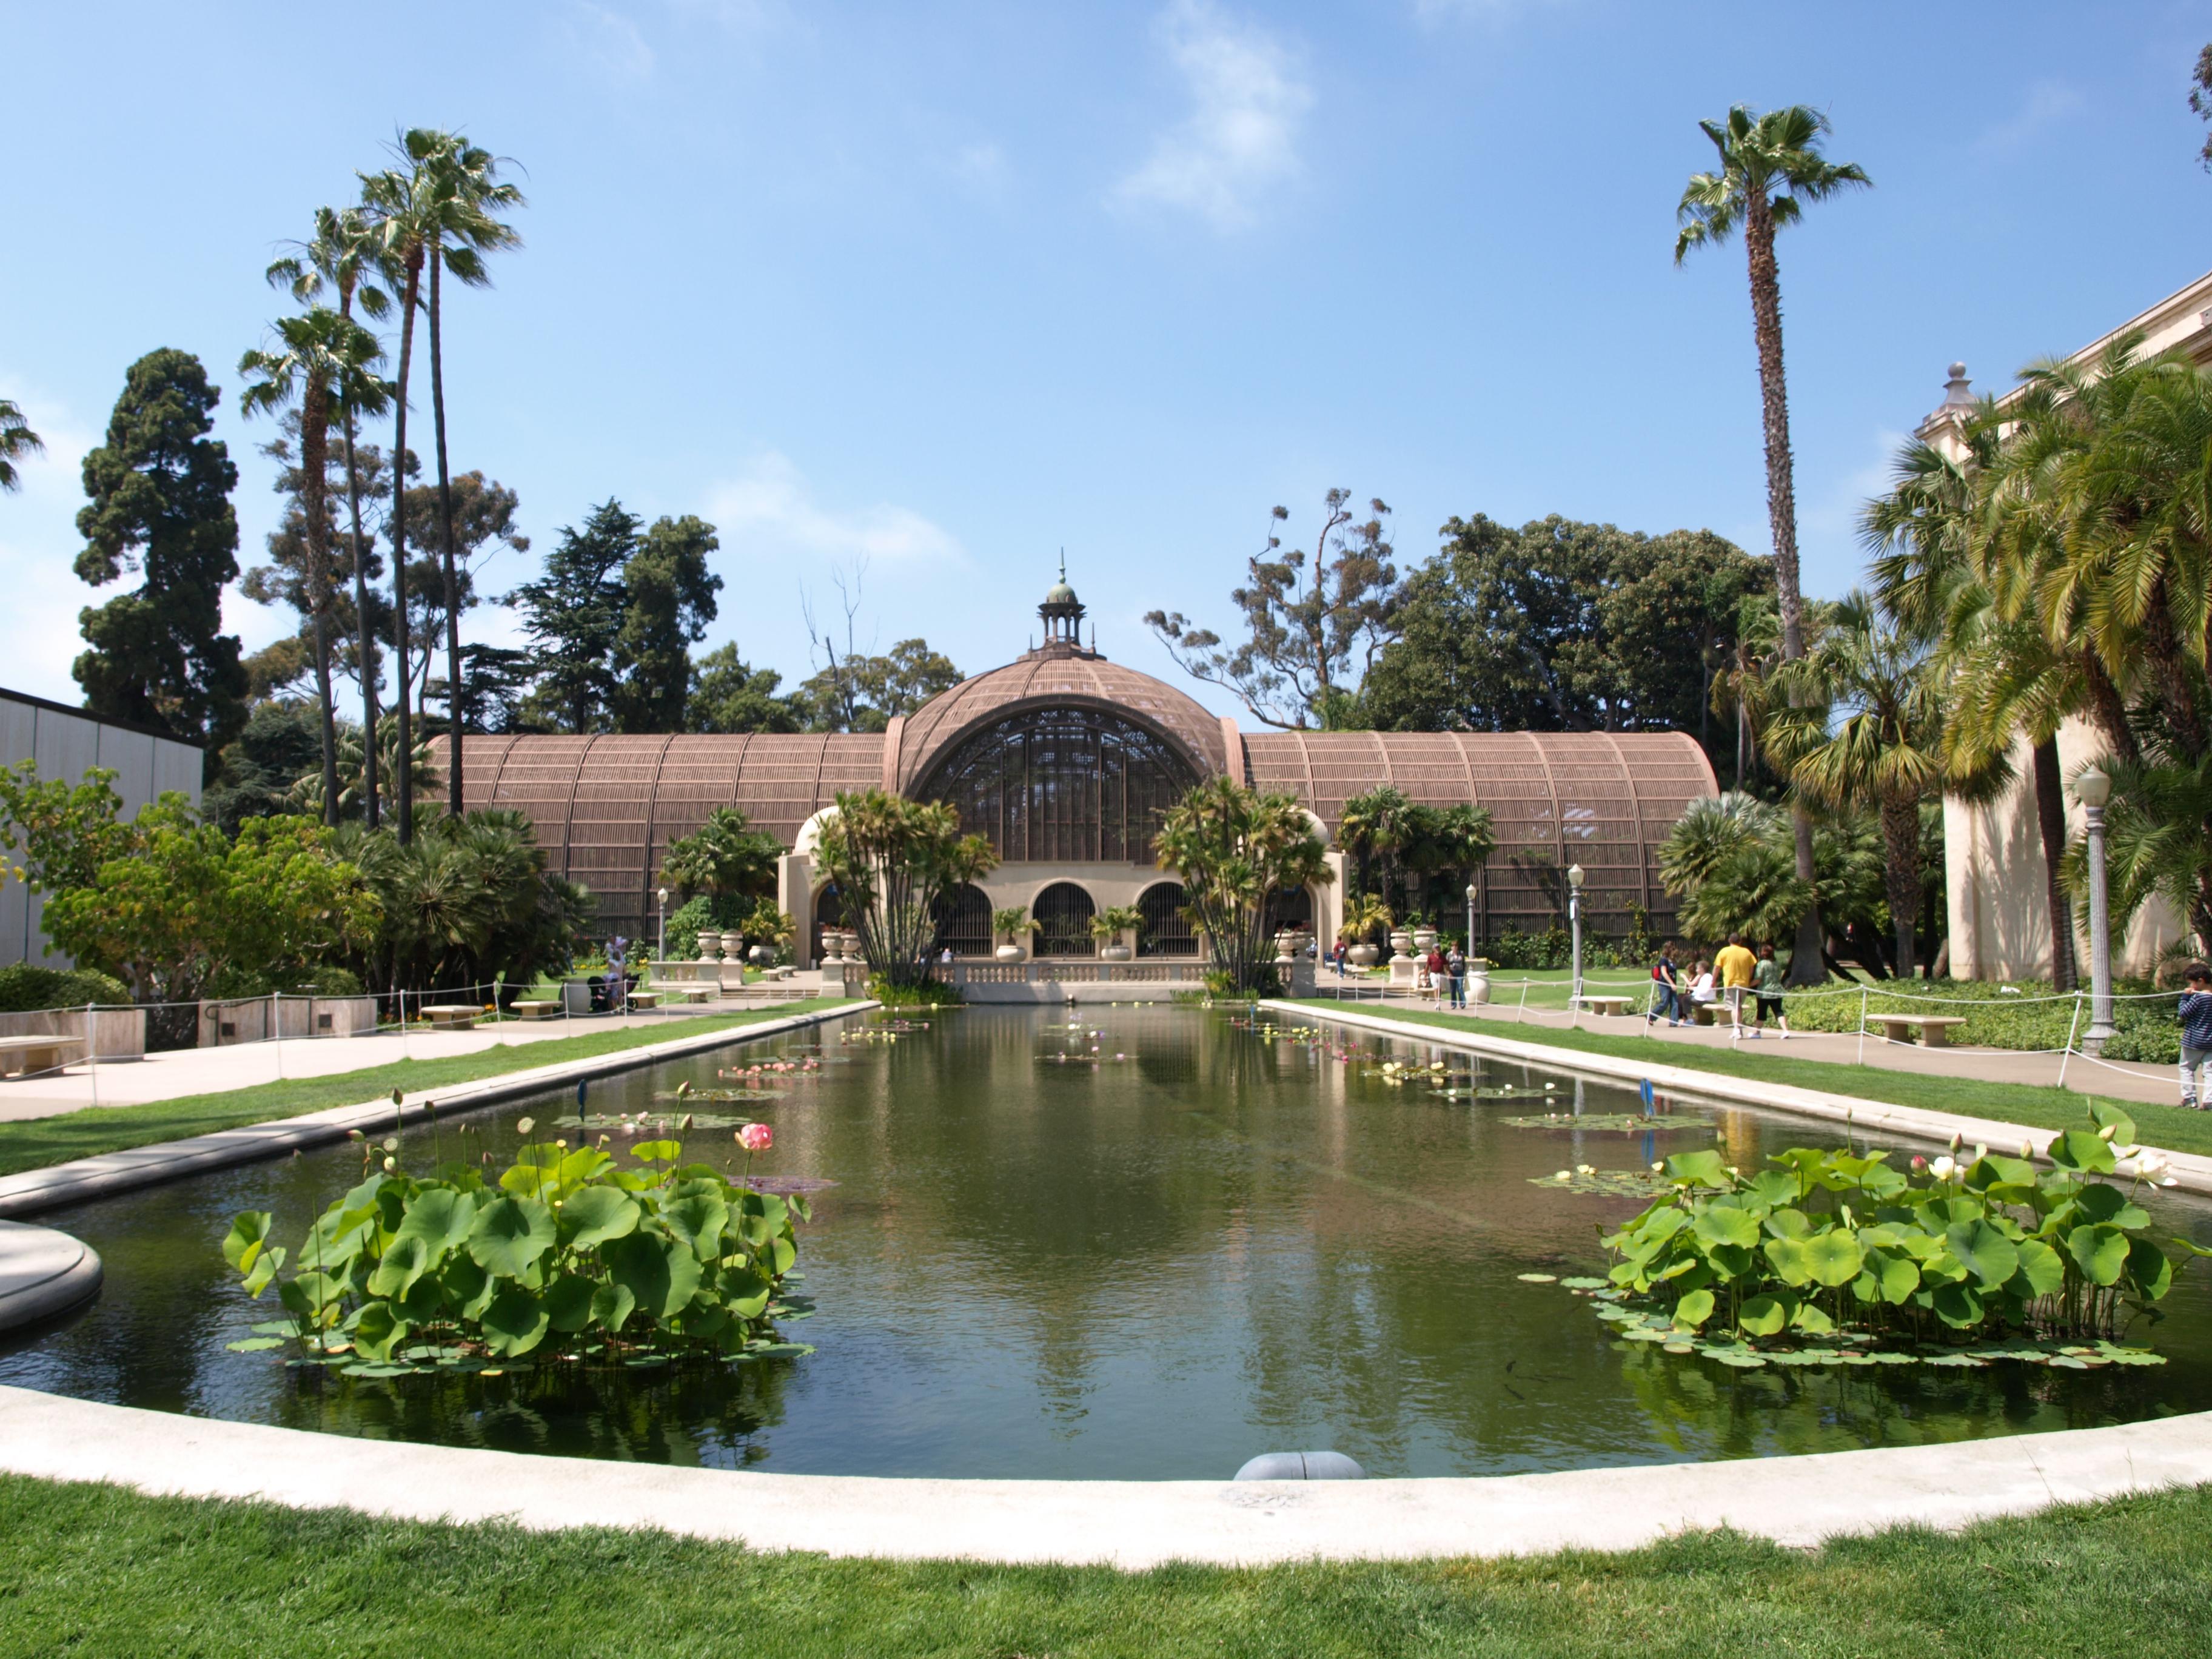 Exceptionnel File:Balboa Parku0027s Botanical Garden.